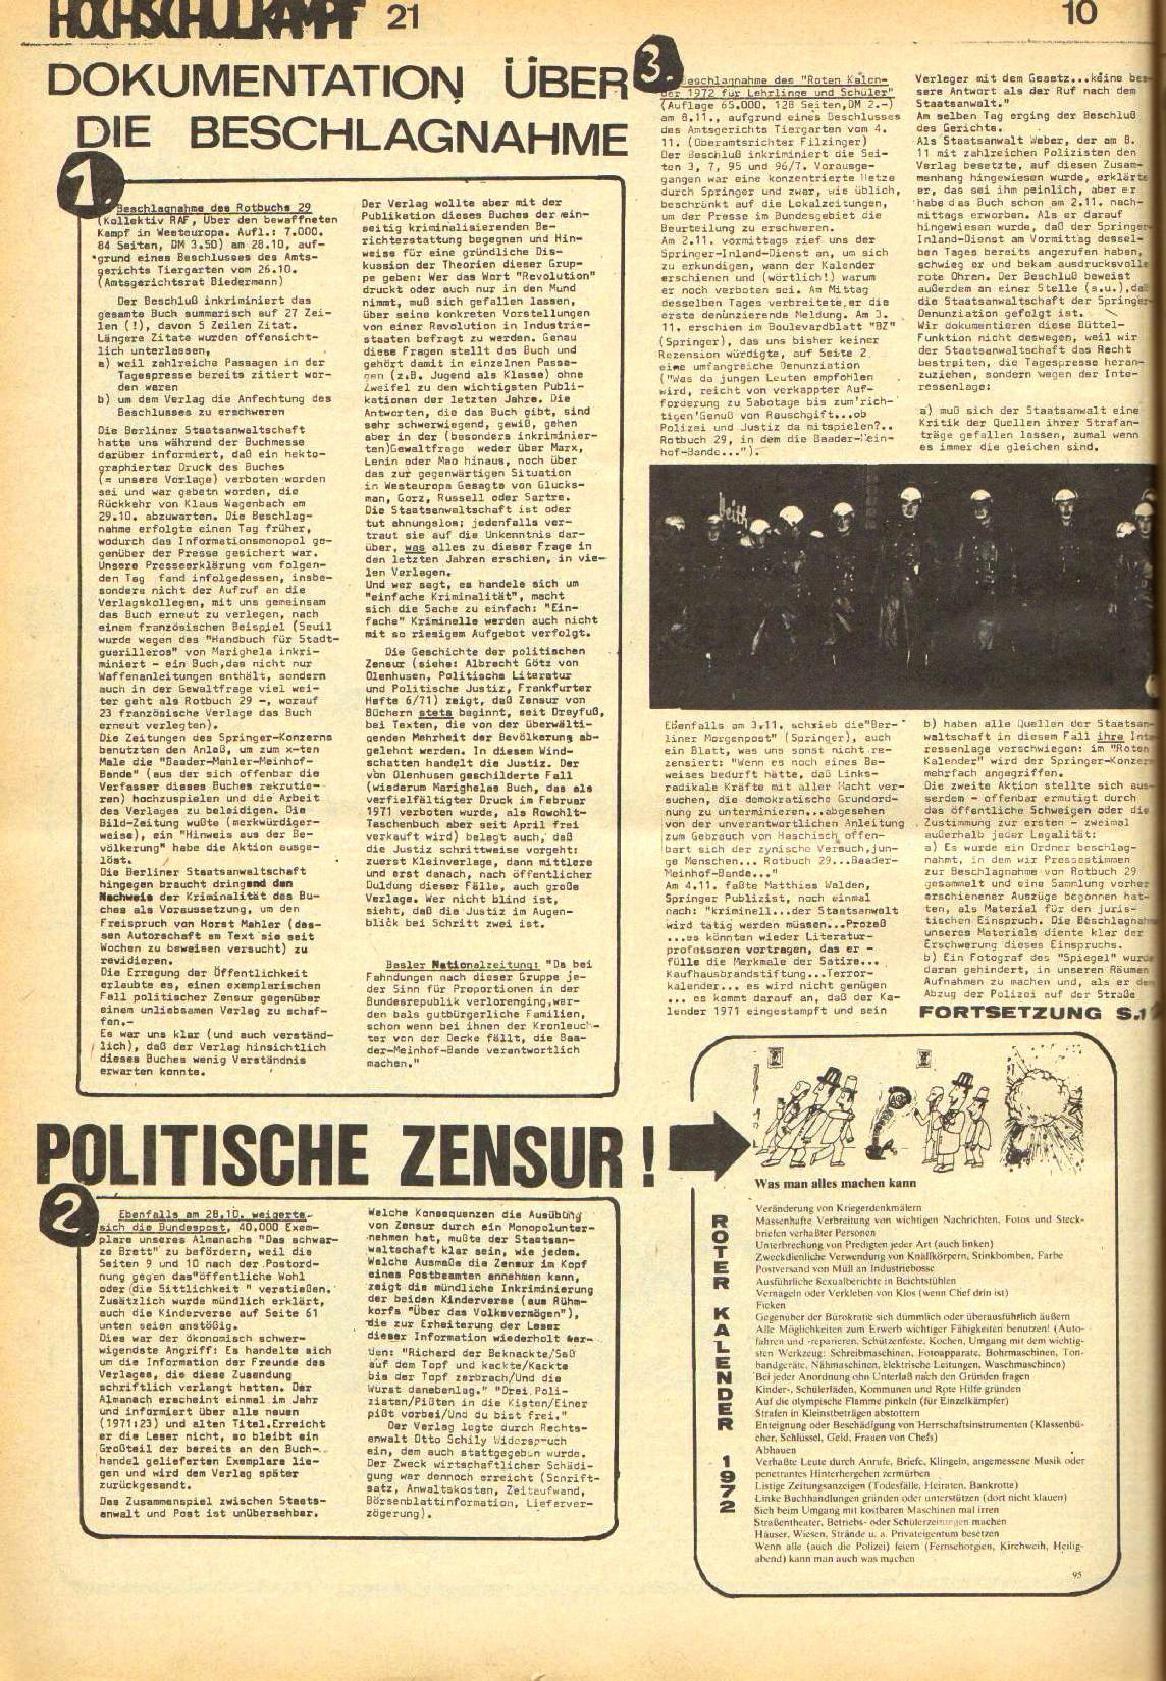 Berlin_Hochschulkampf_1971_21_12